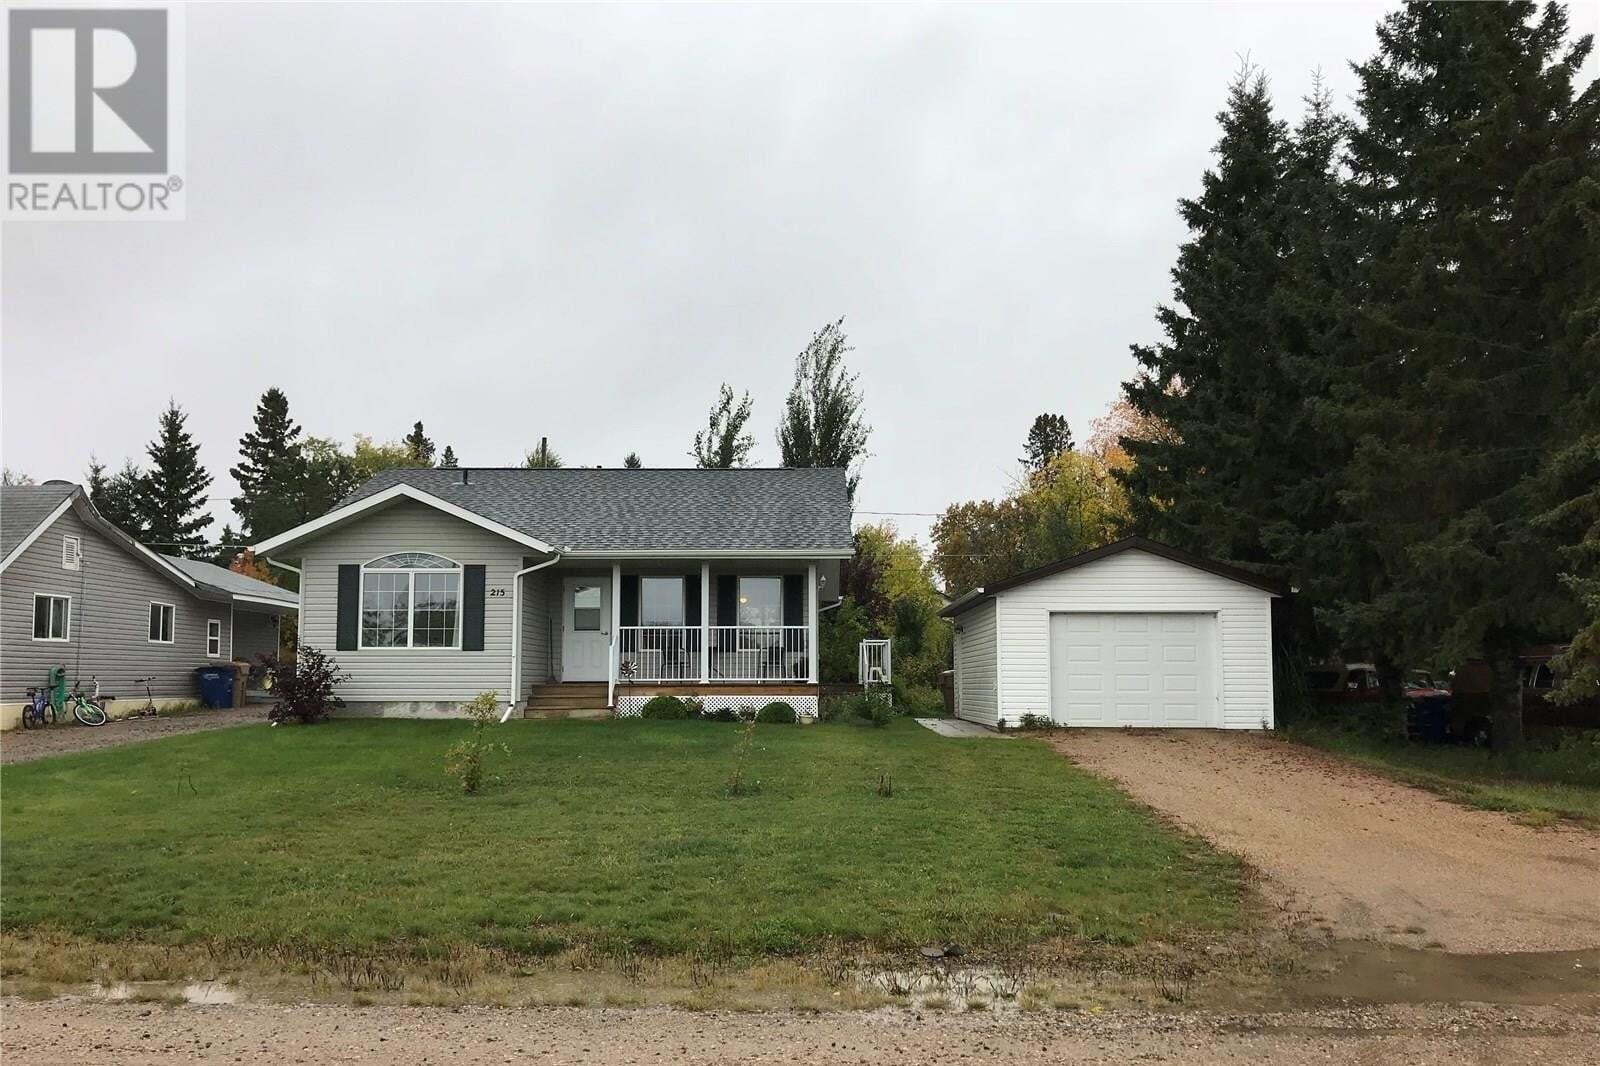 House for sale at 215 5th Ave W Shellbrook Saskatchewan - MLS: SK822121